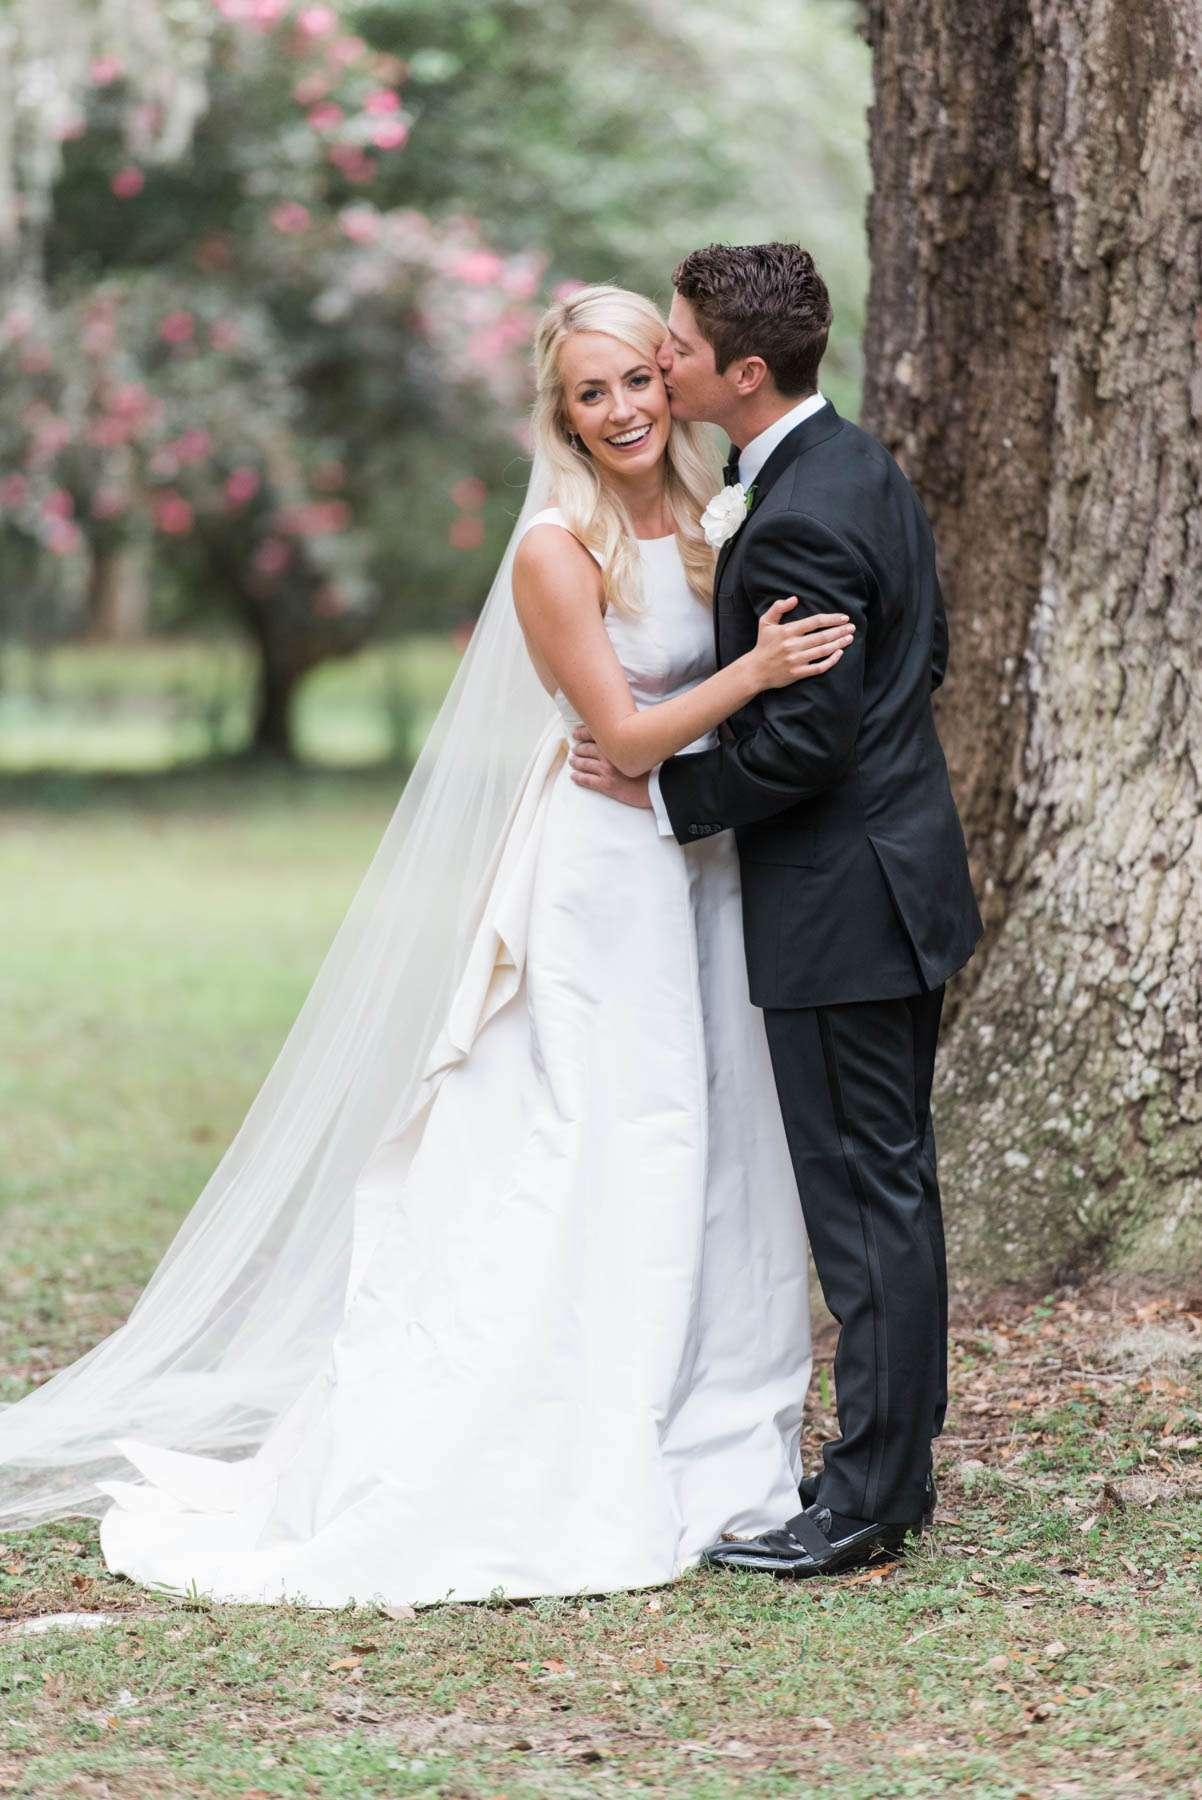 Jillian Attaway of Rhyme & Reason's Charleston Wedding on Southern Weddings